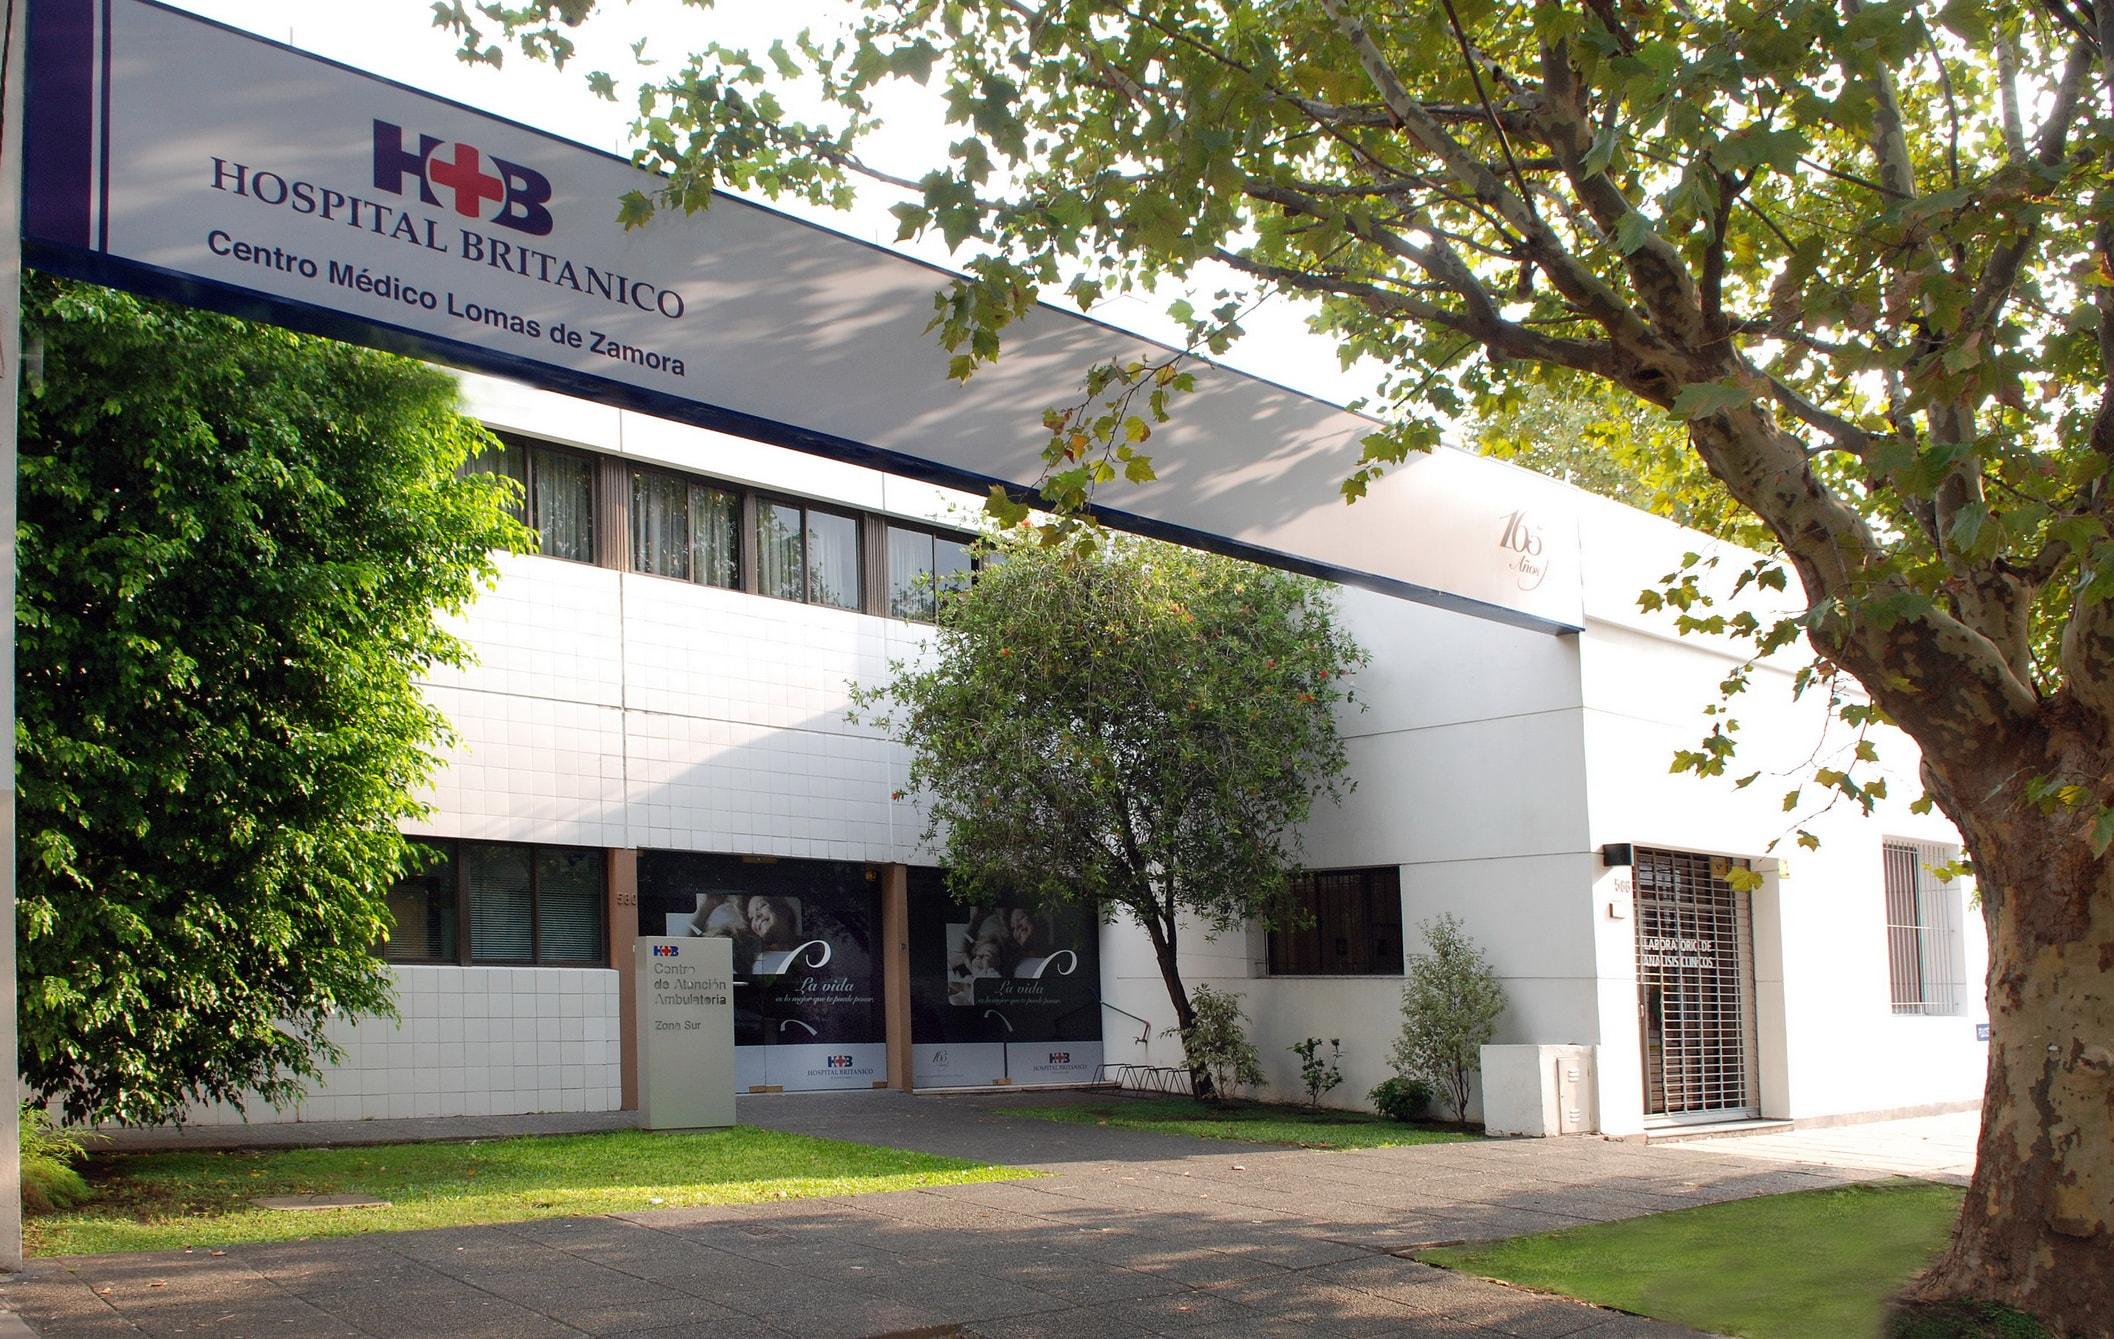 Fachada Hospital Británico Lomas de Zamora